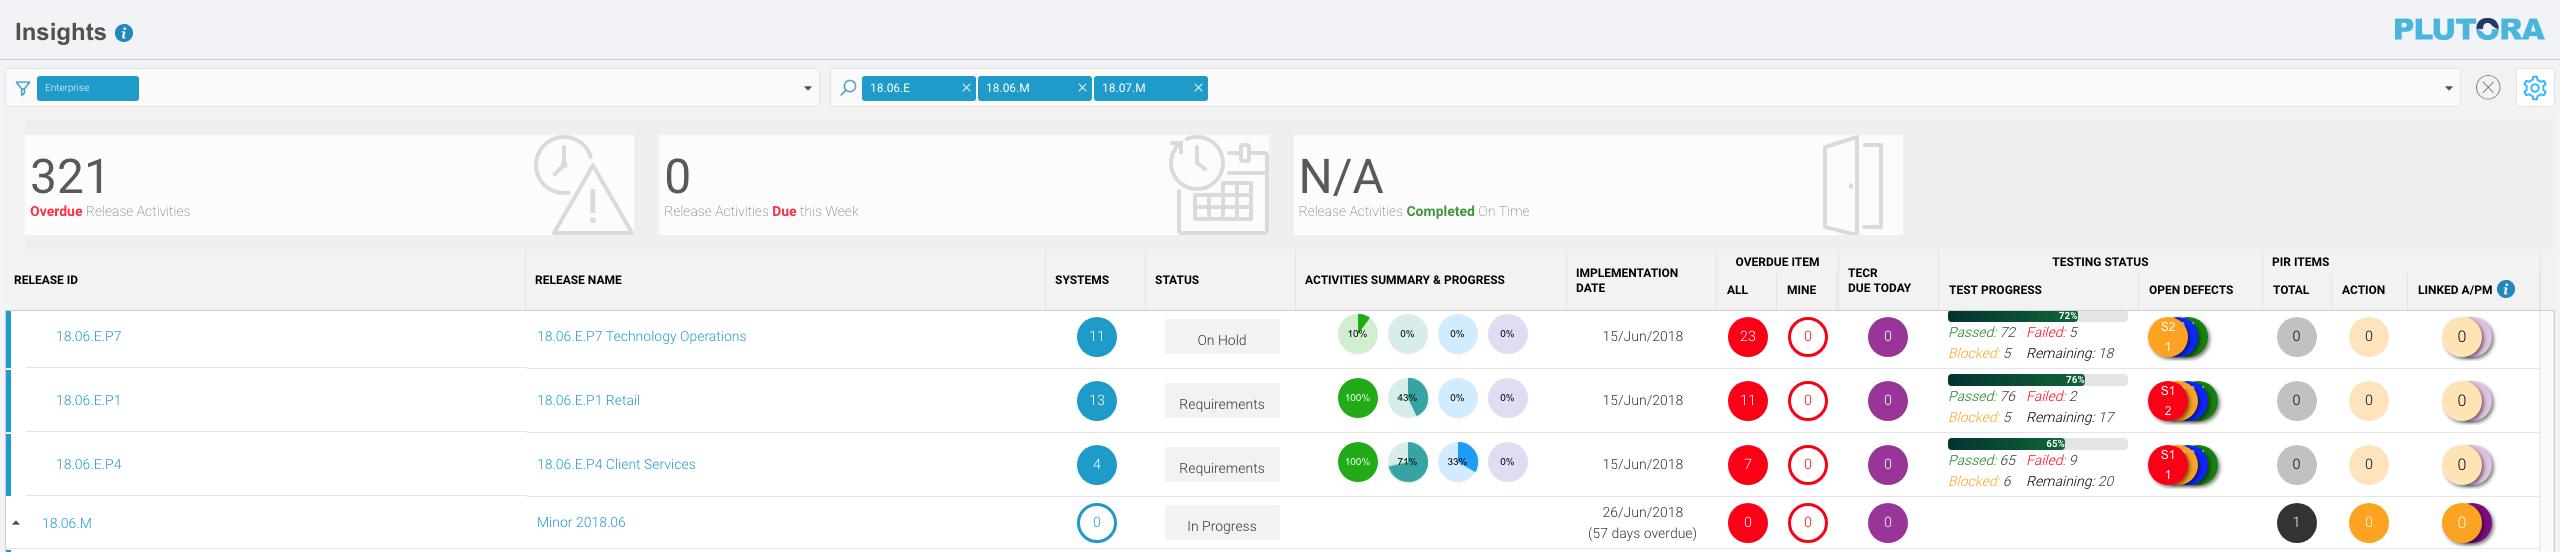 Manage Insights Dashboard   Plutora Knowledge Base